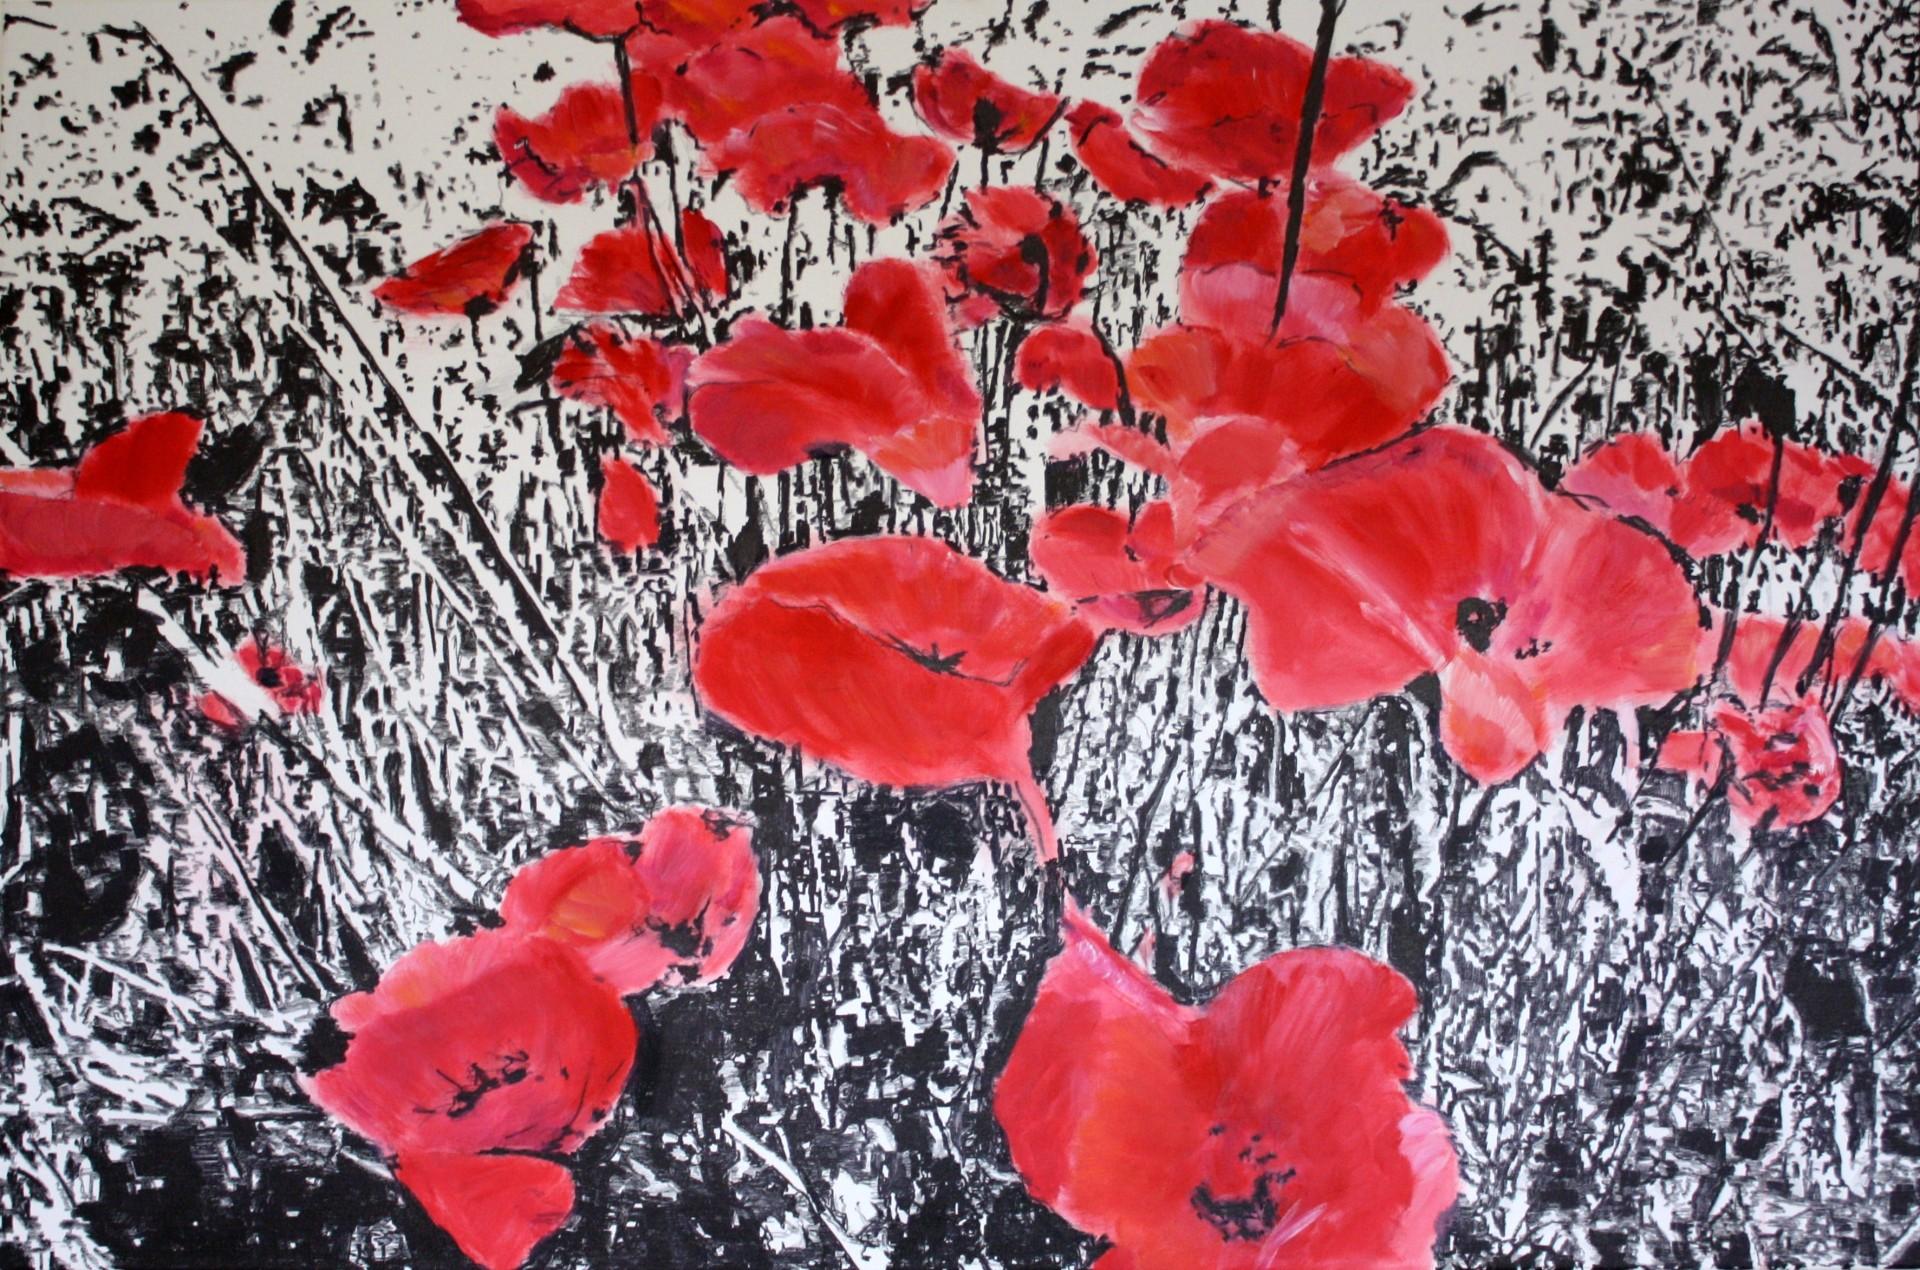 Flowers, 2013, Edding und Acryl auf Leinwand, 100 x 150 cm